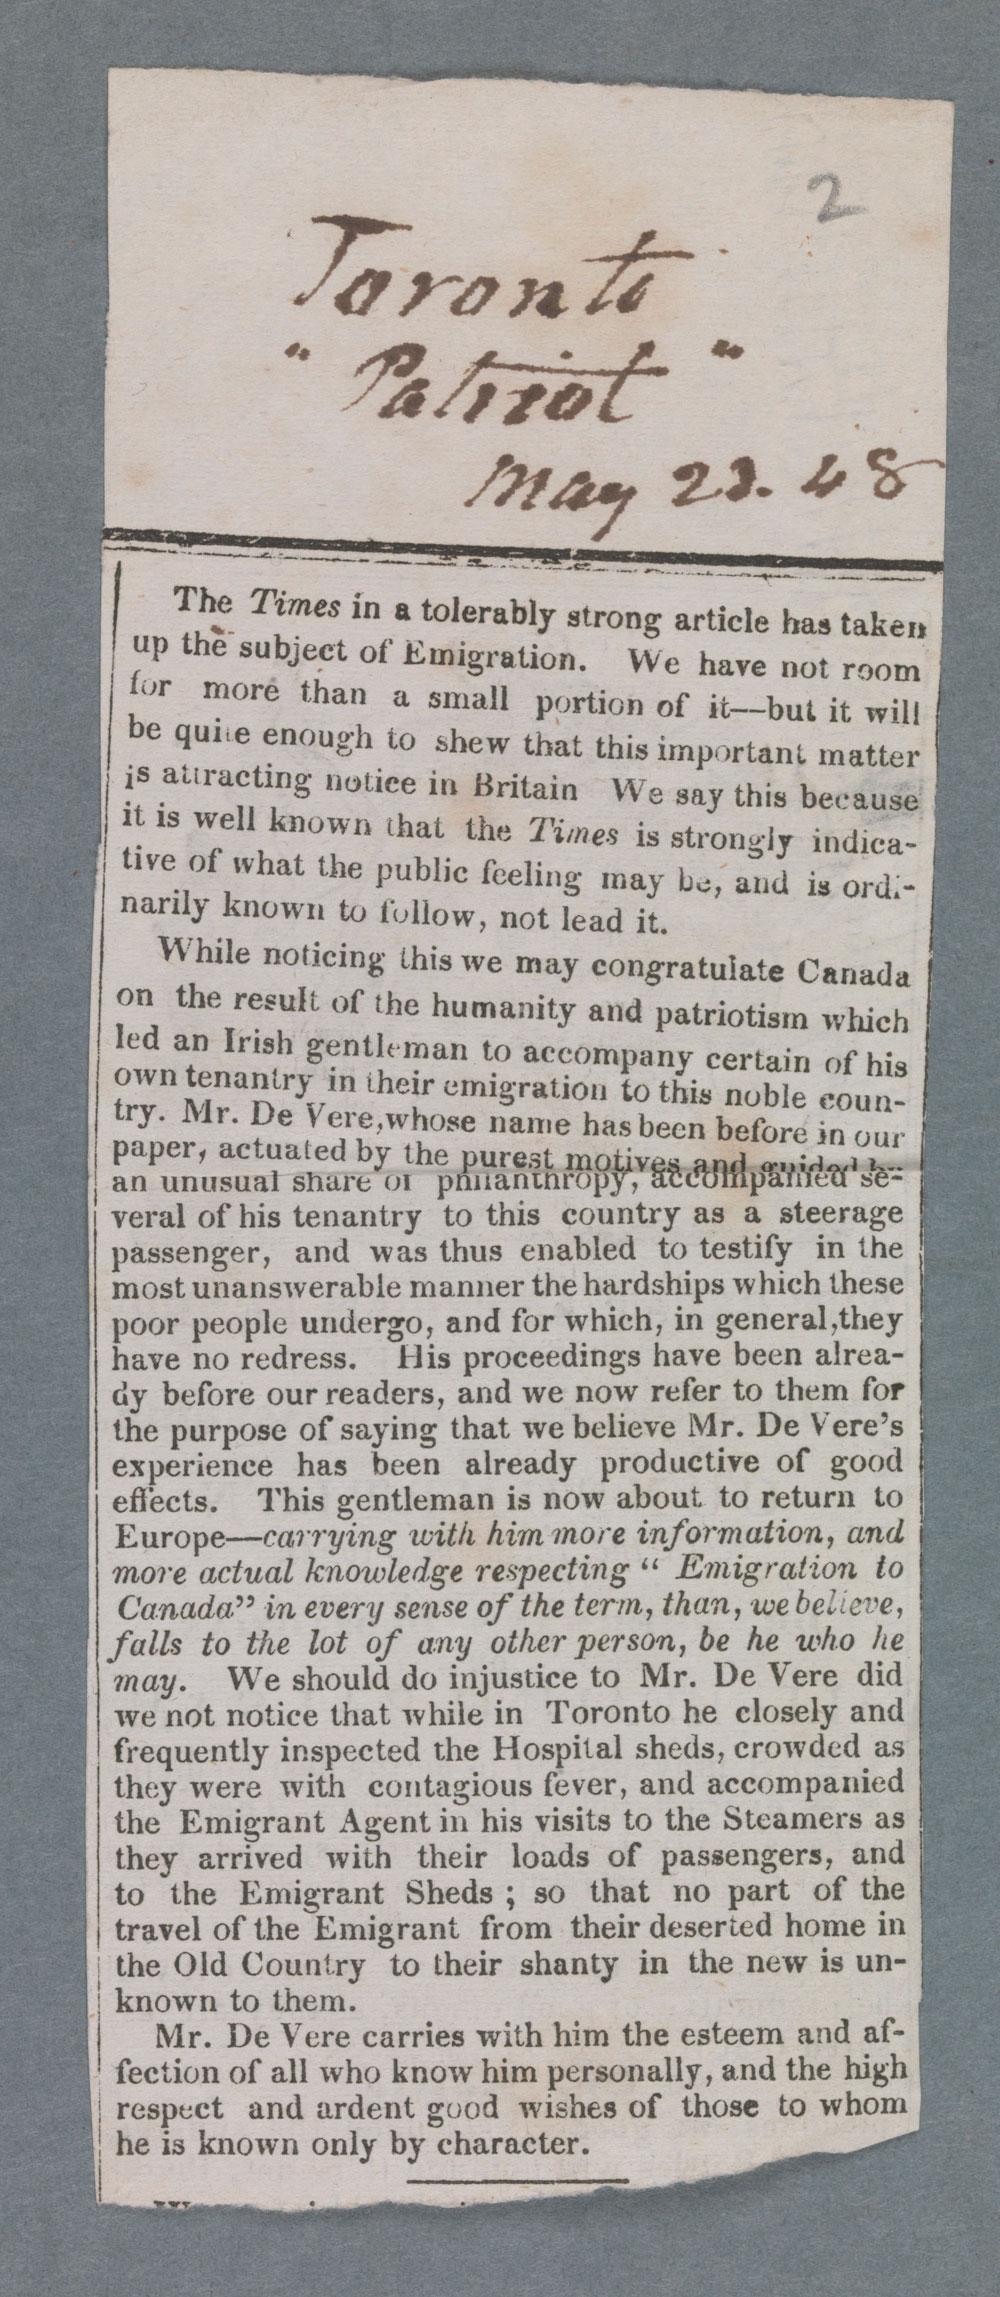 Newspaper Clipping - Toronto Patriot. 23 May, 1848.